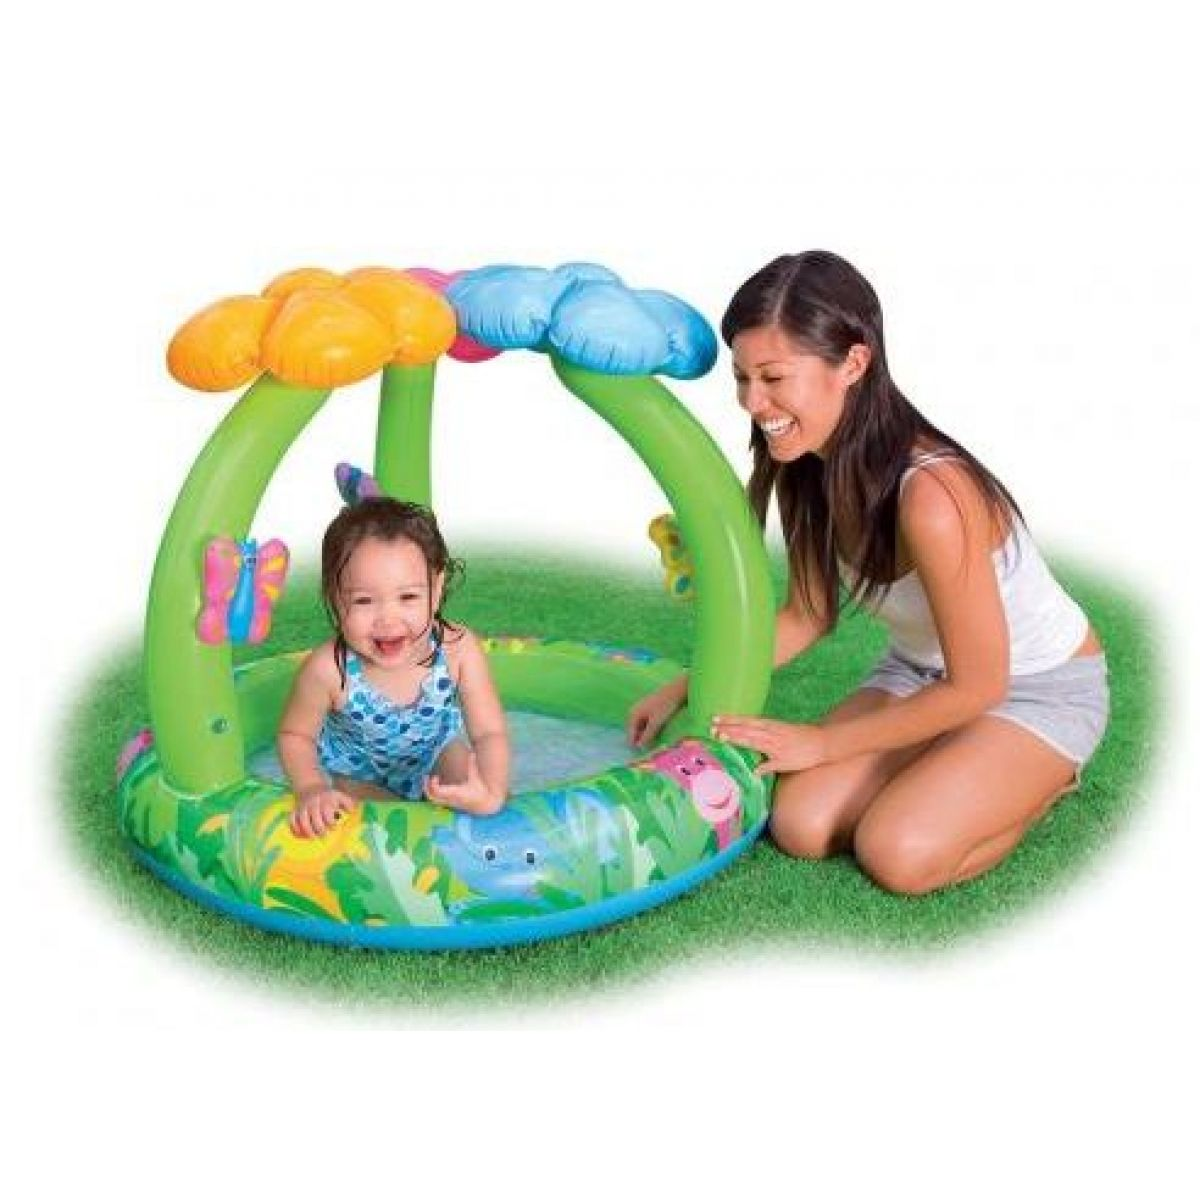 Intex 57419 Dětský bazének džungle s kytičkami